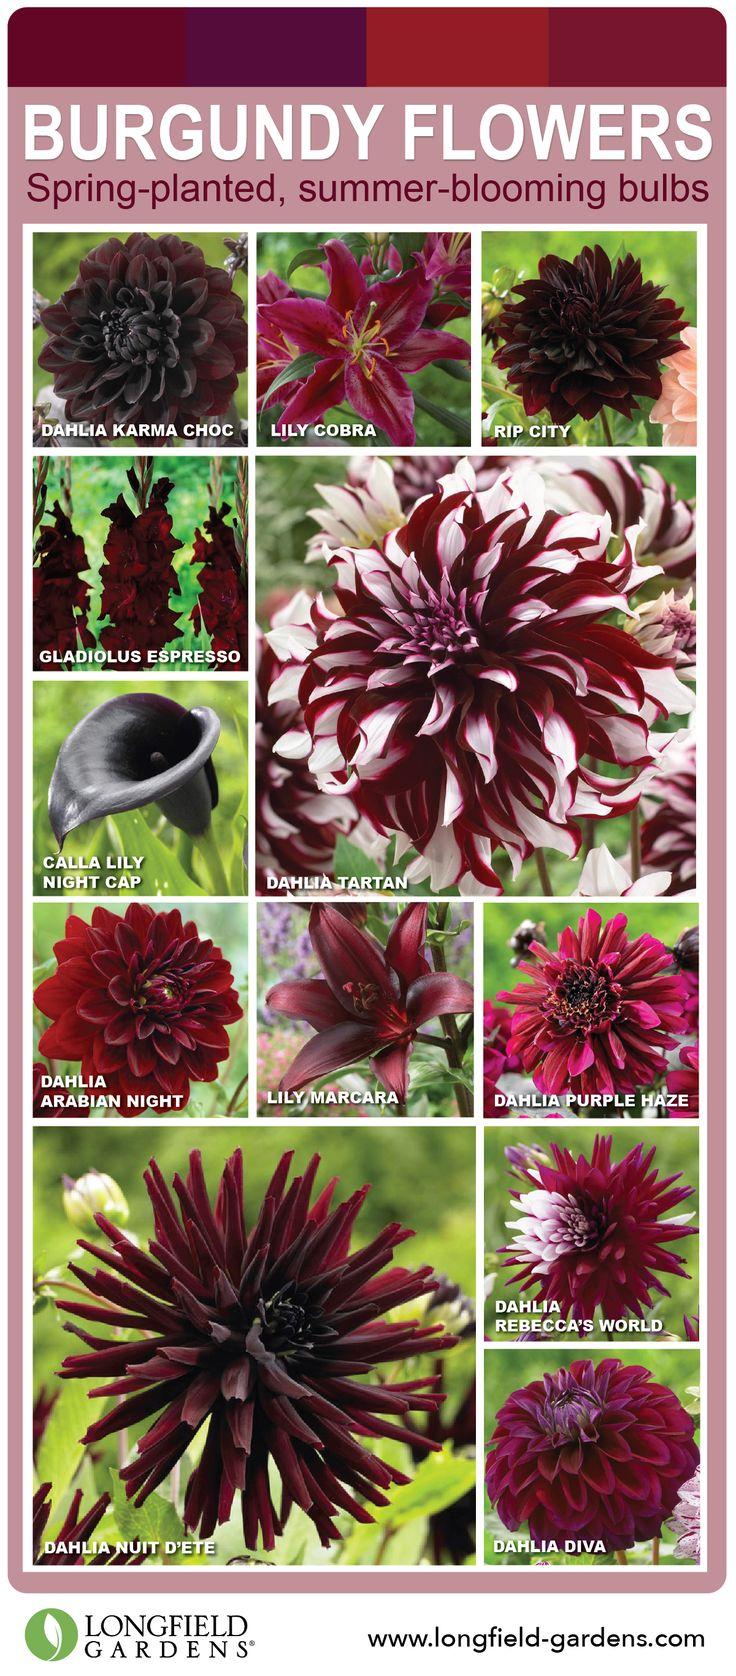 25+ best ideas about Burgundy Flowers on Pinterest.